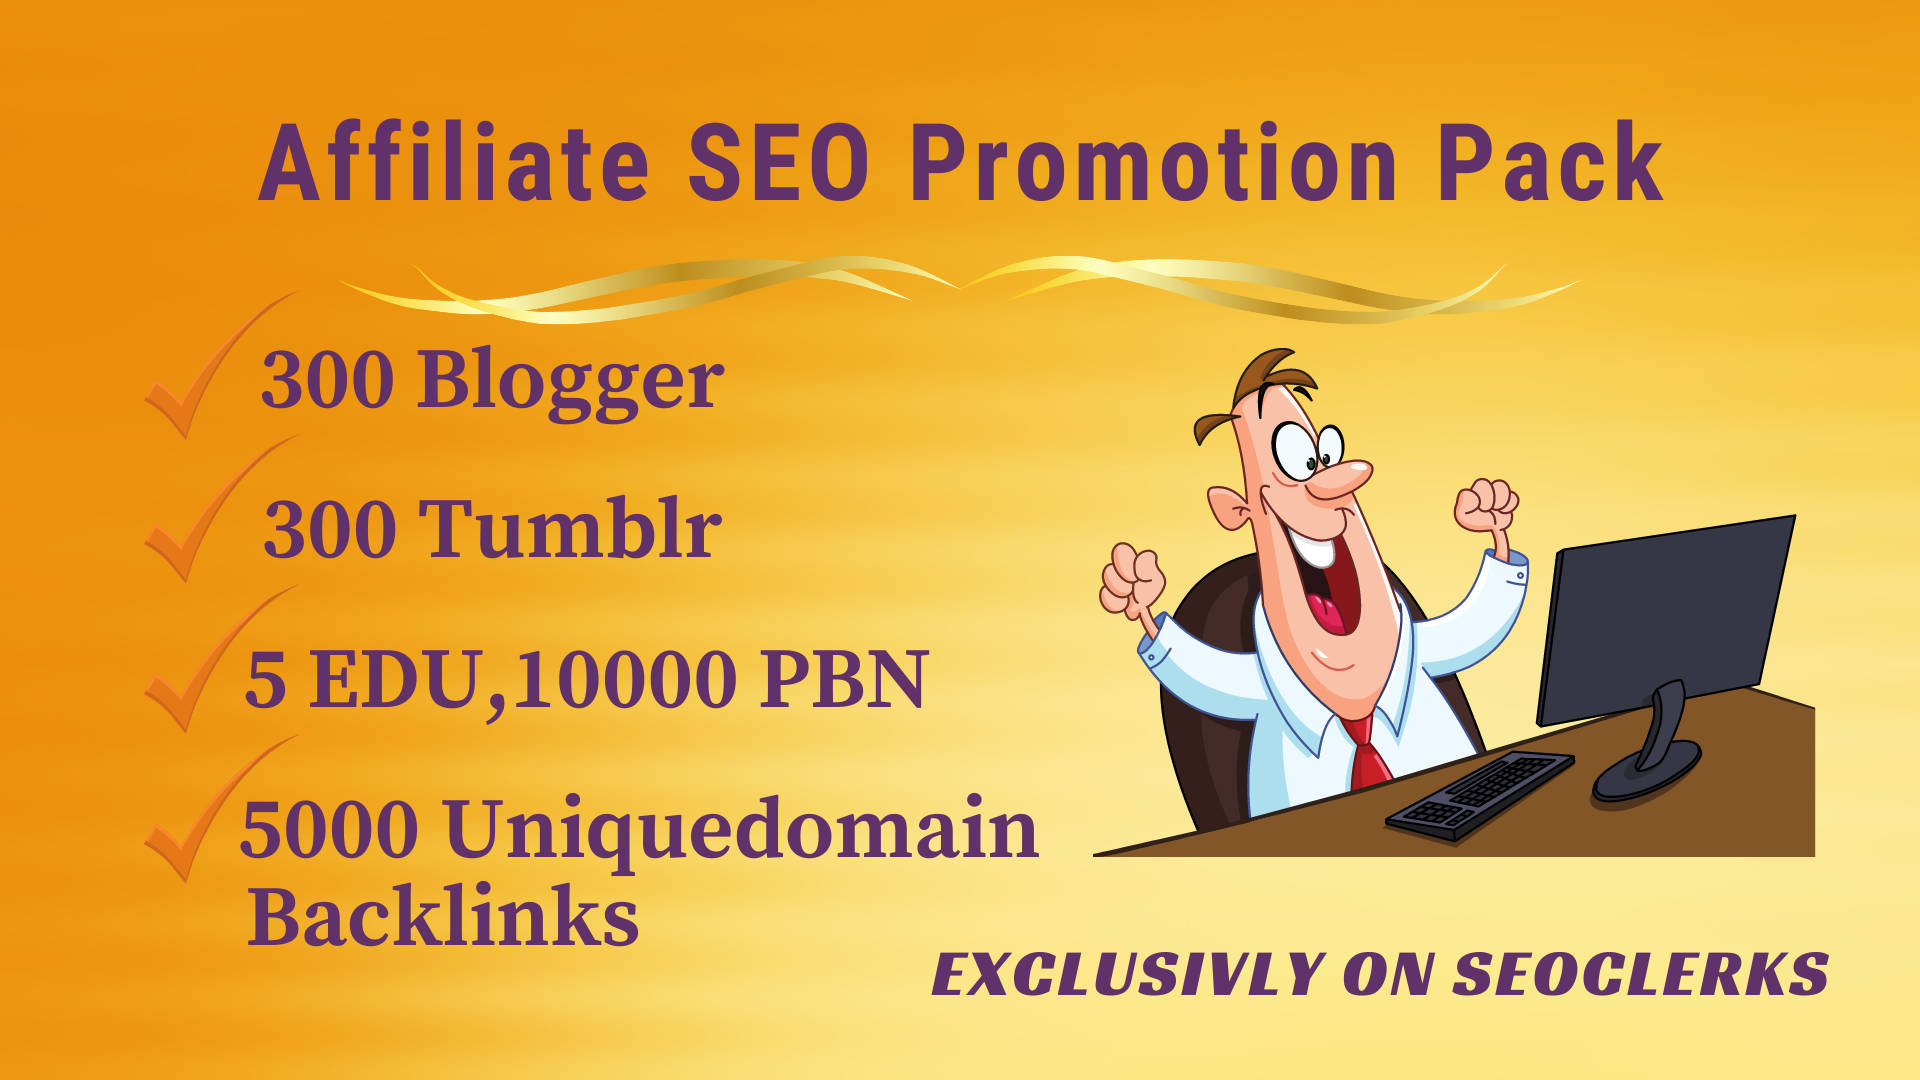 Affiliate SEO Promo Pack -Get 5 EDU,  300 Blogger, Tumblr 10000 PBN,  5000 uniquedomain backlinks